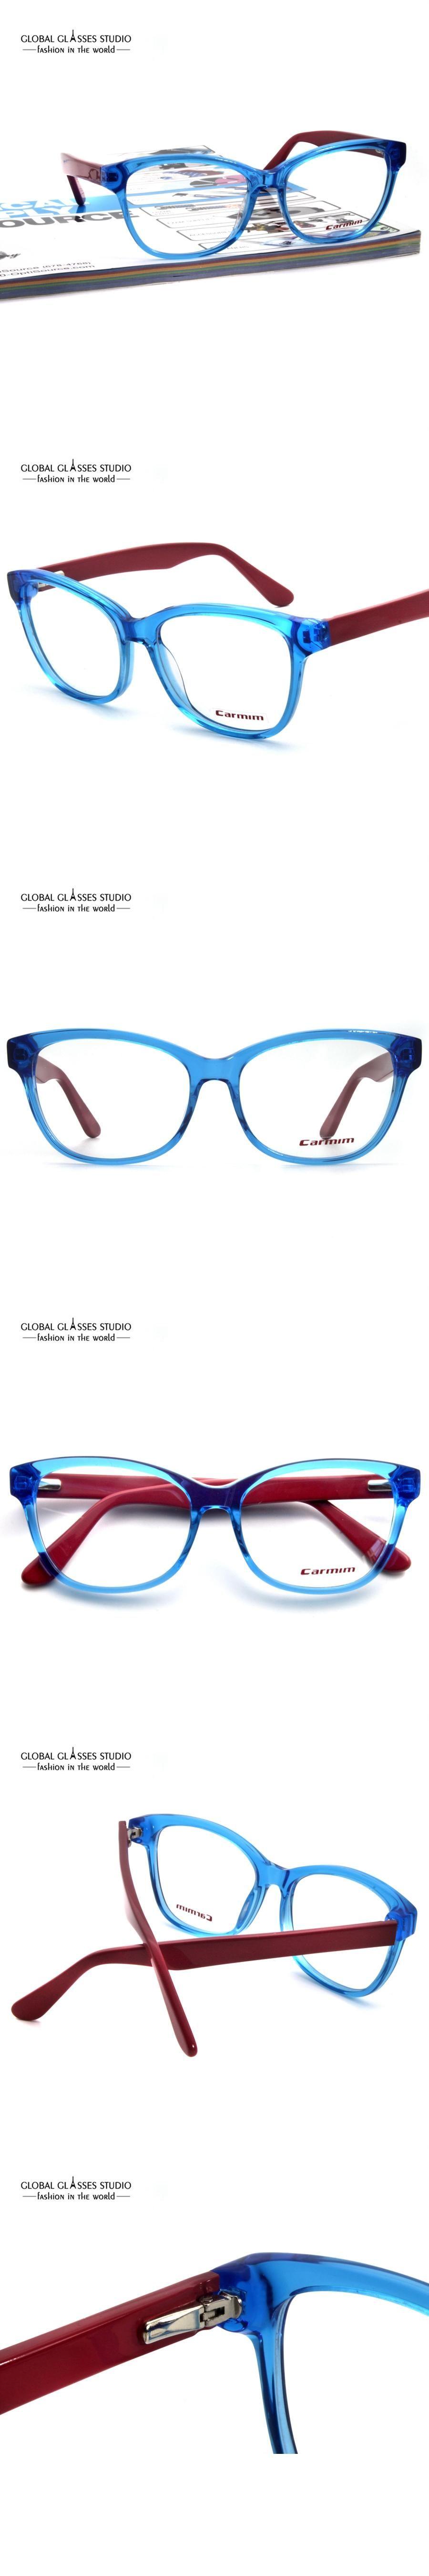 New Crystal Blue Dark Red Cute Men/Women Fashion Design Glasses ...